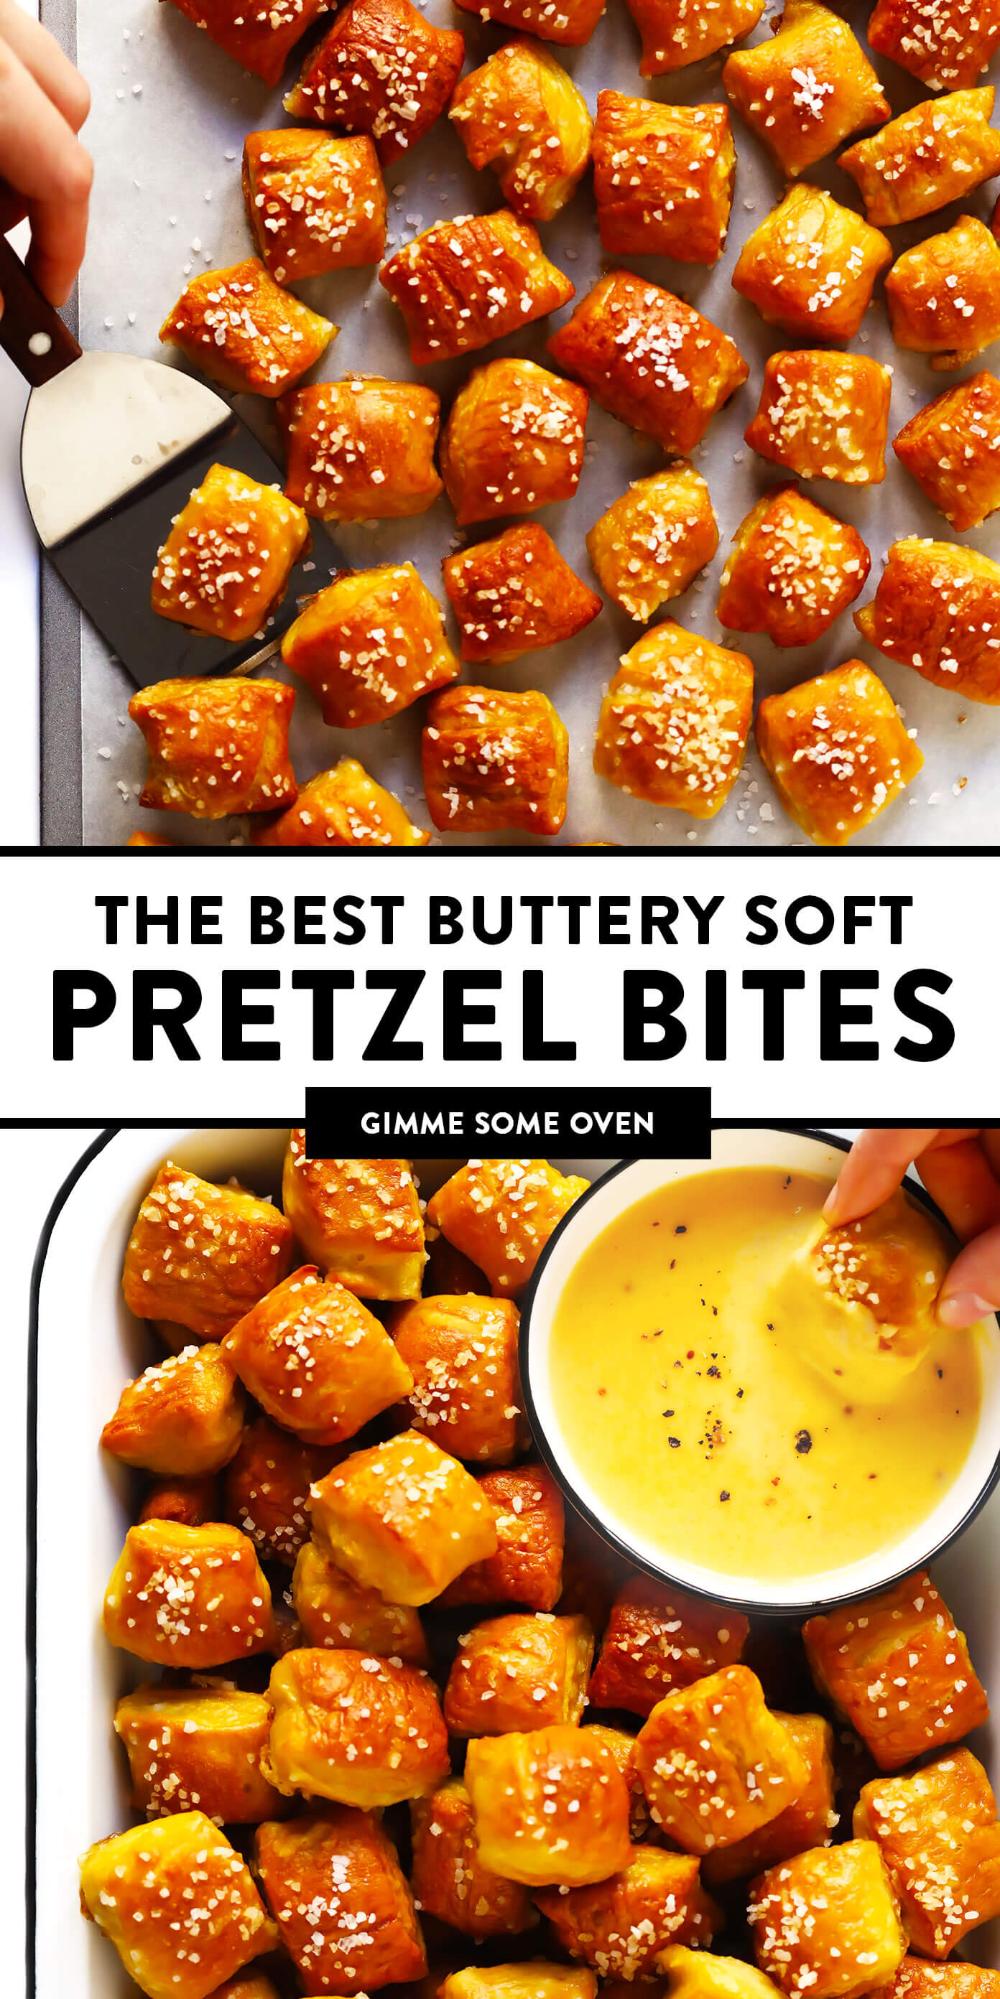 Buttery Soft Pretzel Bites | Gimme Some Oven